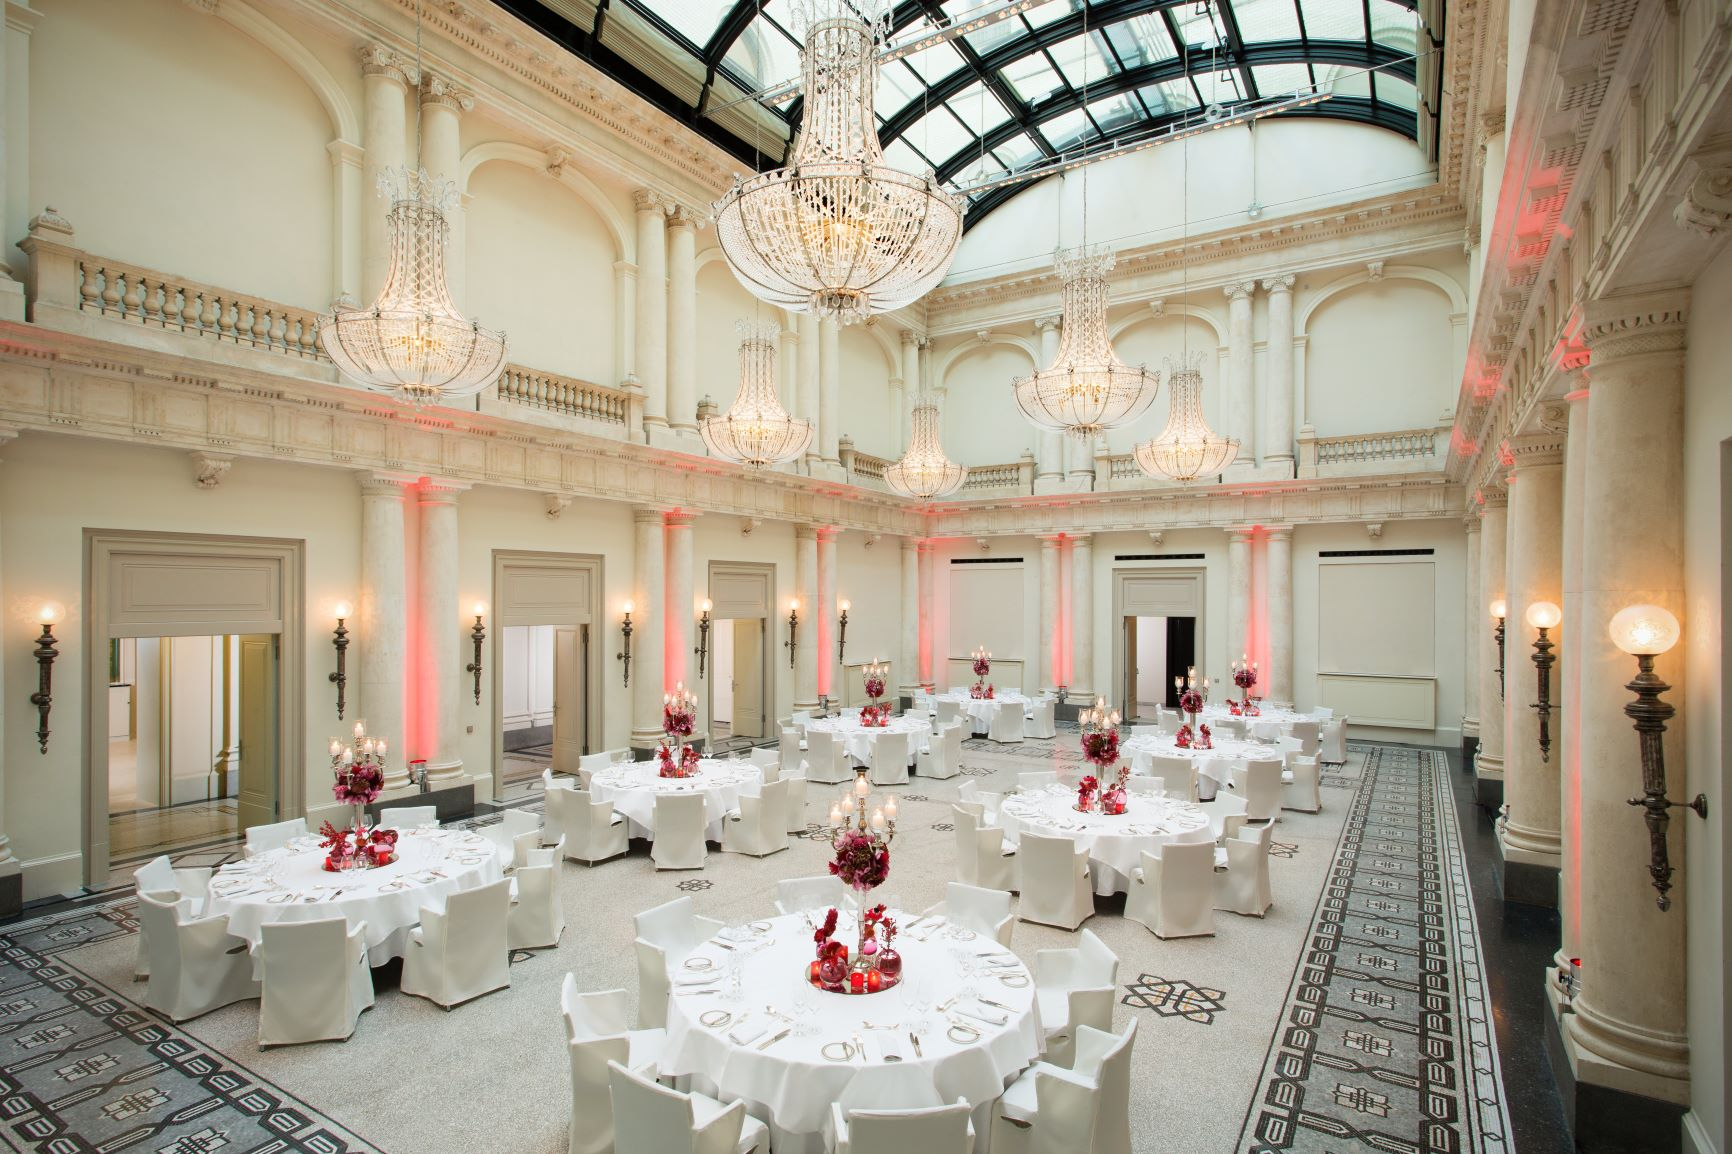 ROM Ballroom Hotel de rome berlin